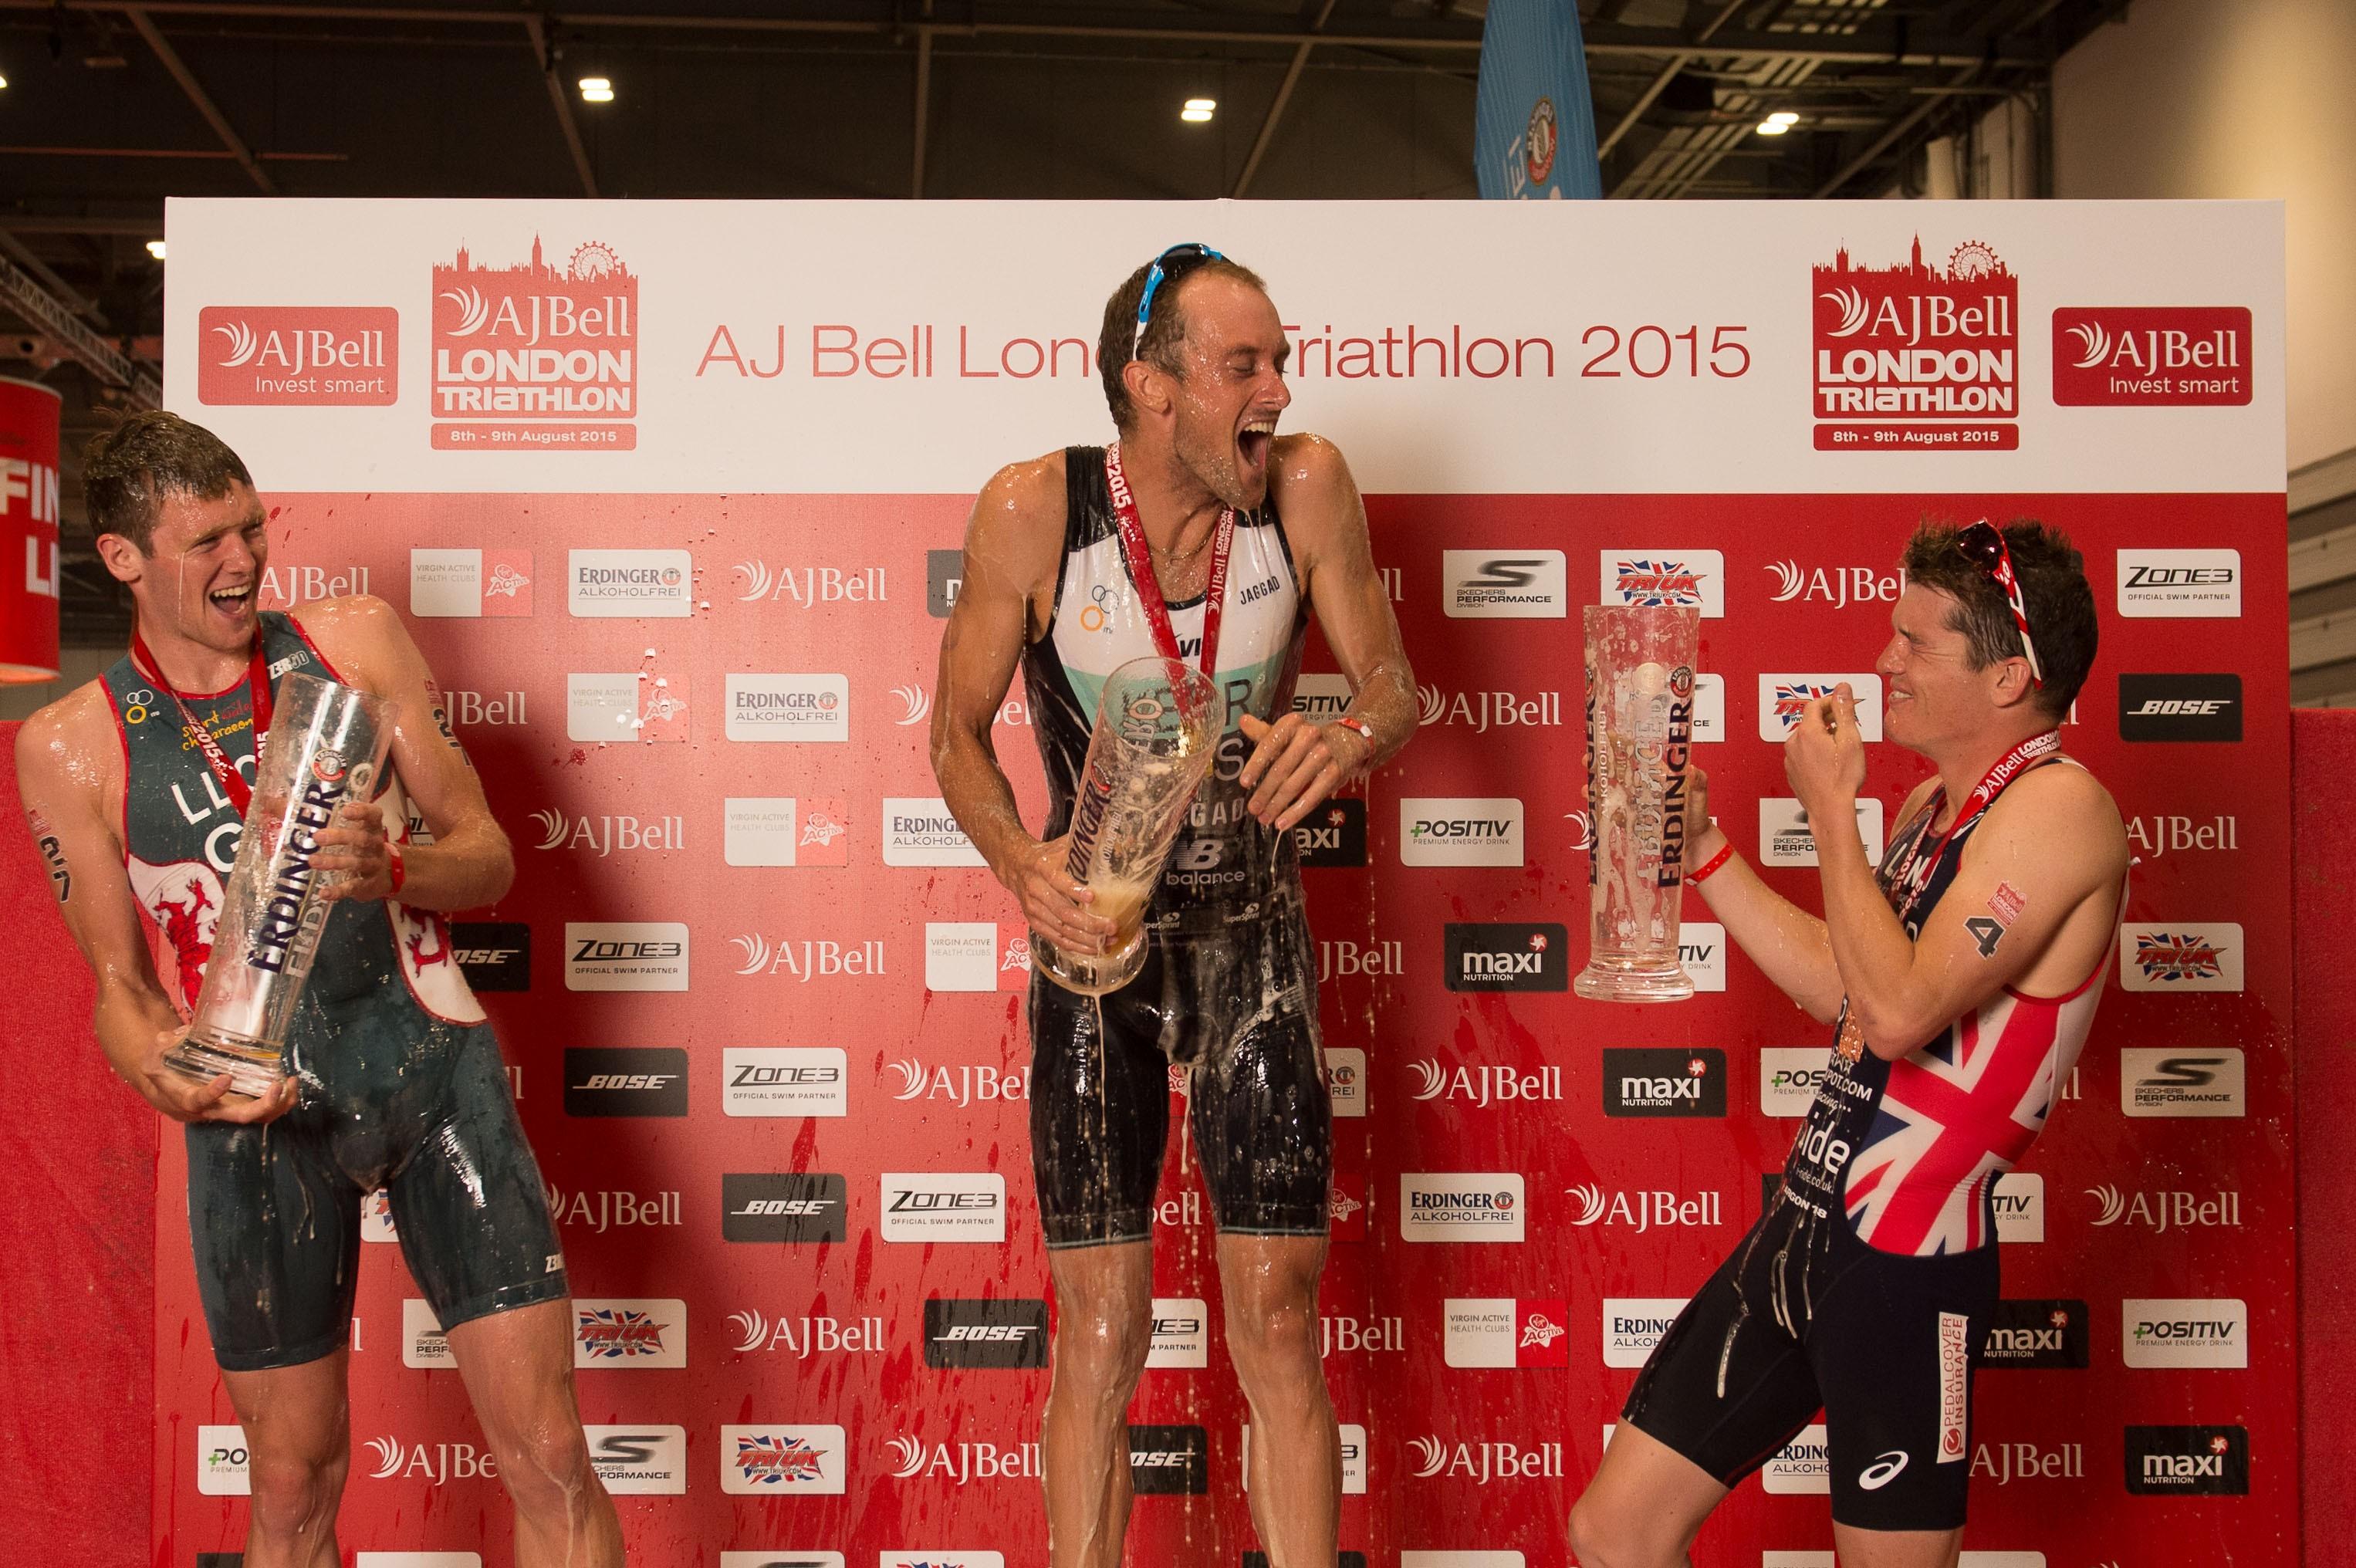 London Triathlon - cover image